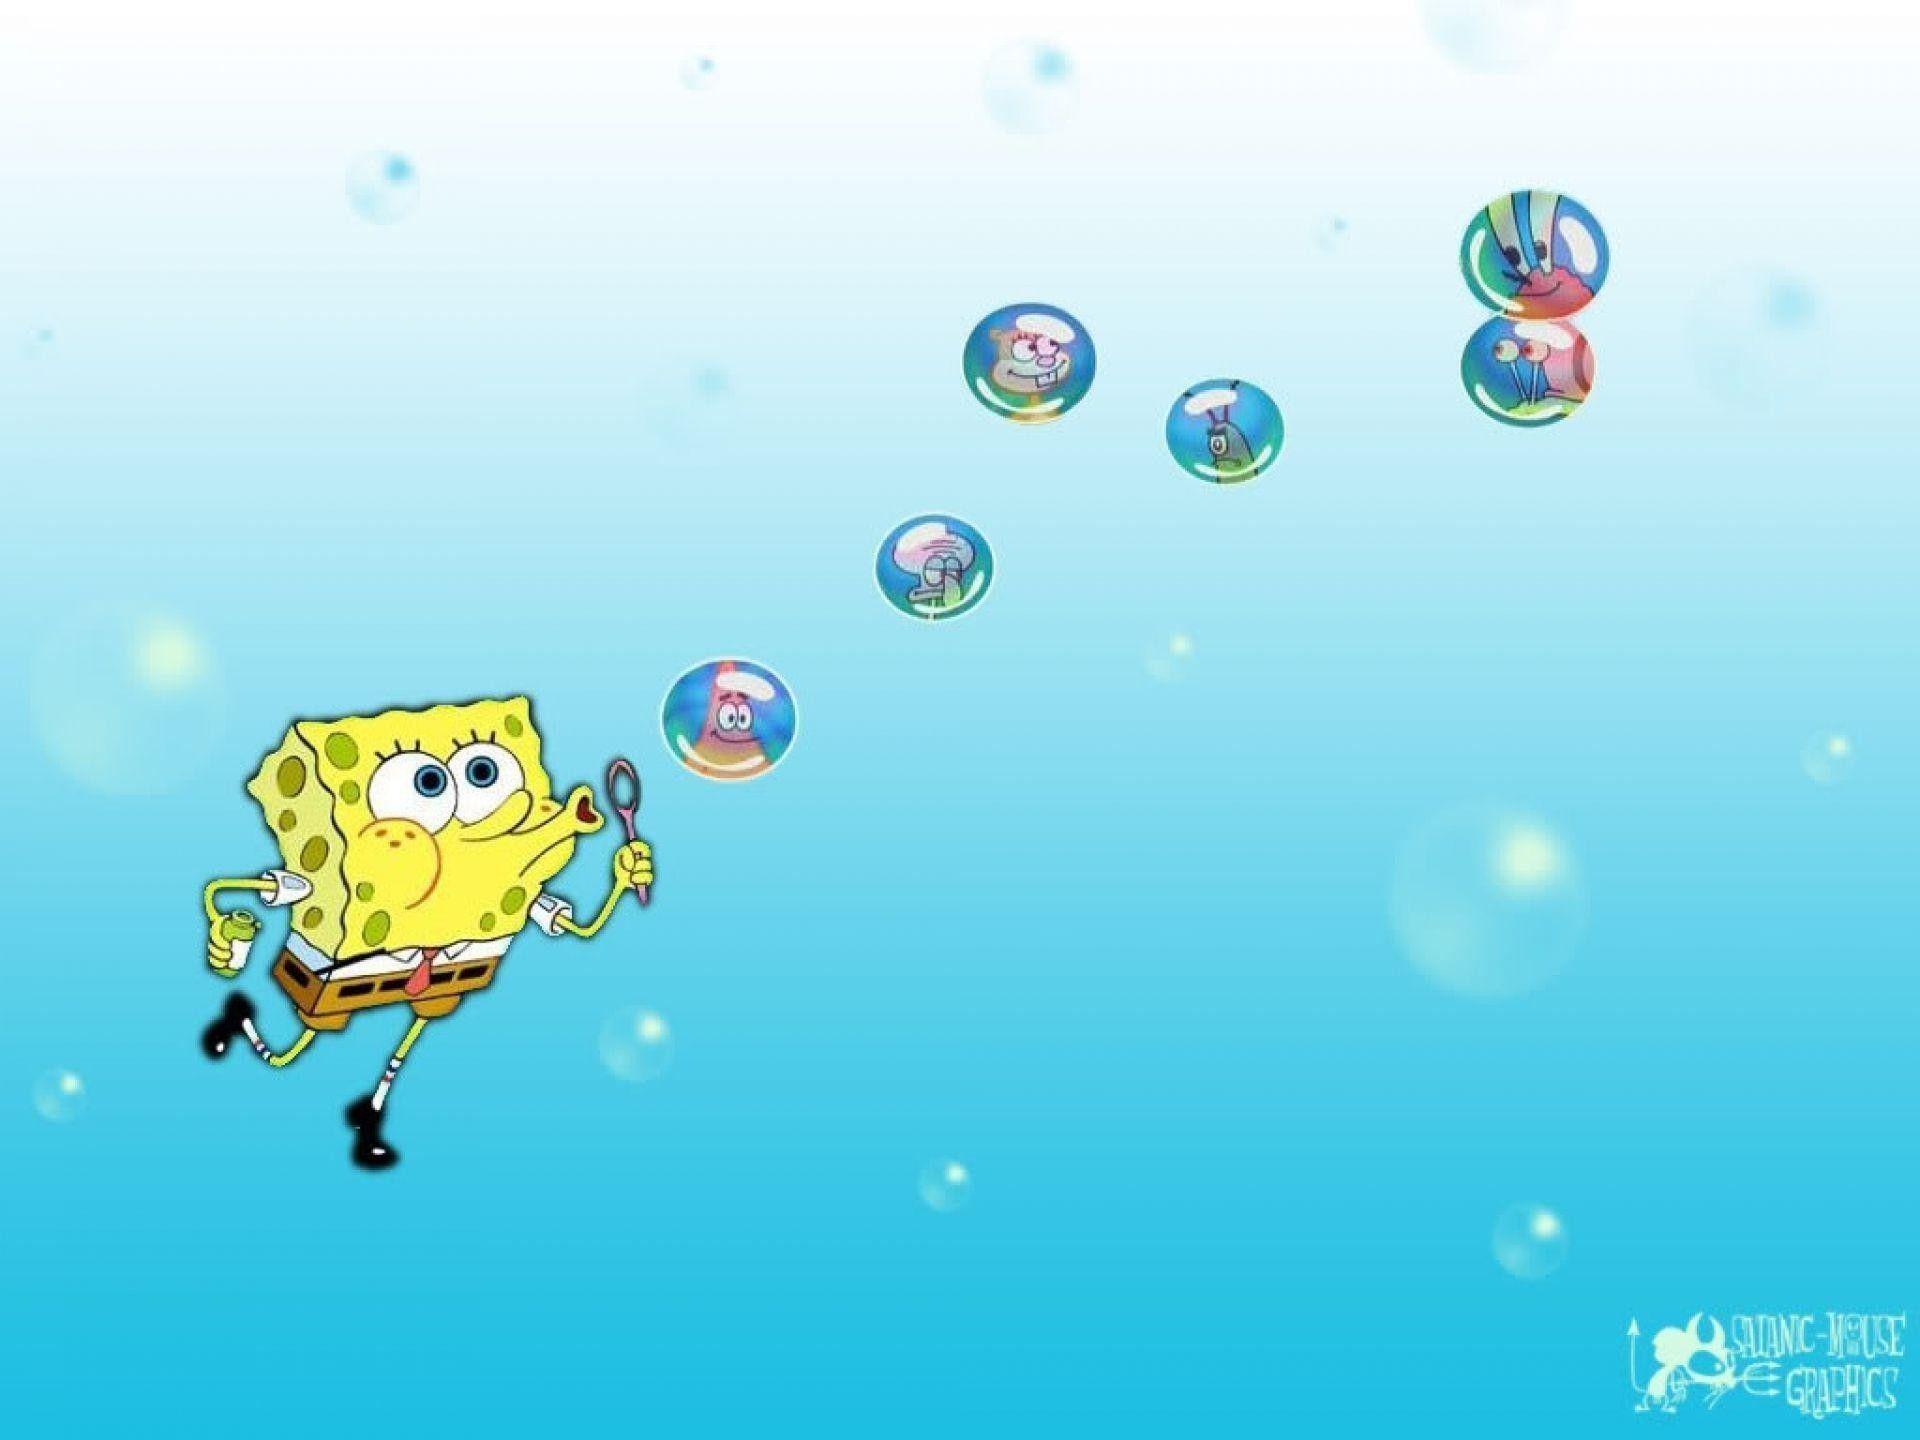 Wallpaper For Laptop Spongebob